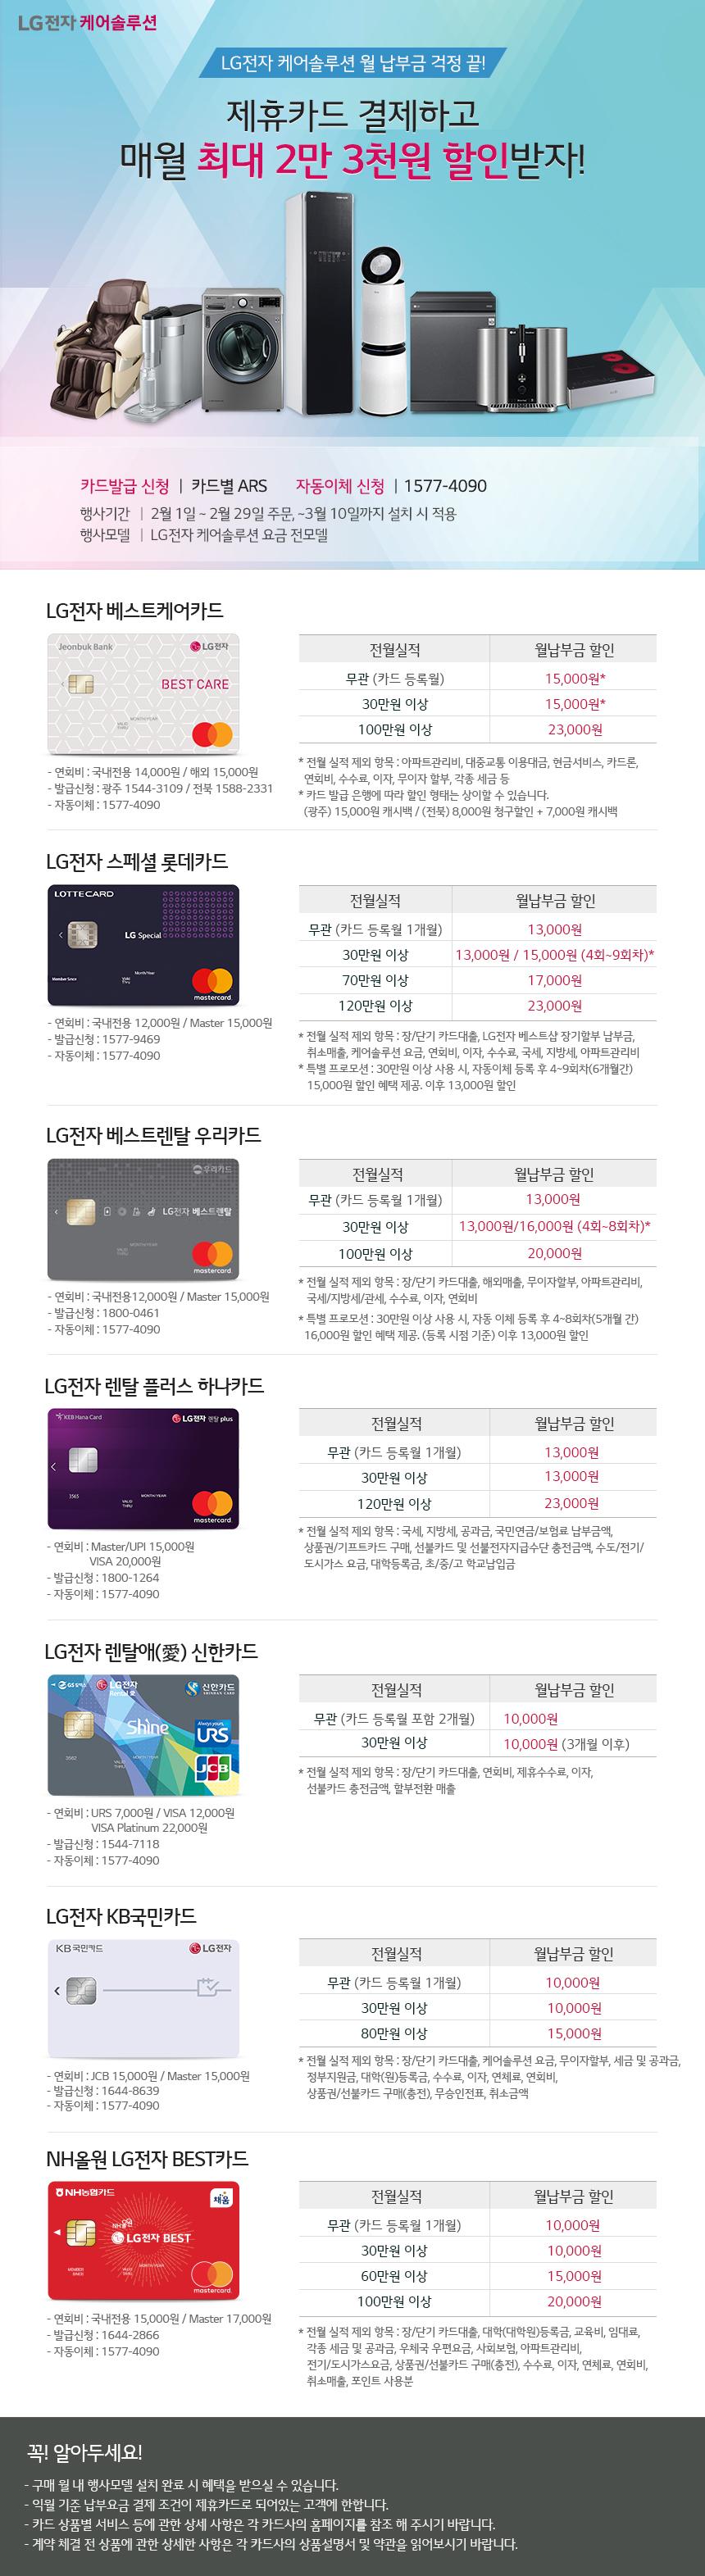 [USP 배너 - 판촉] 2월 제휴 카드 할인 이벤트.jpg